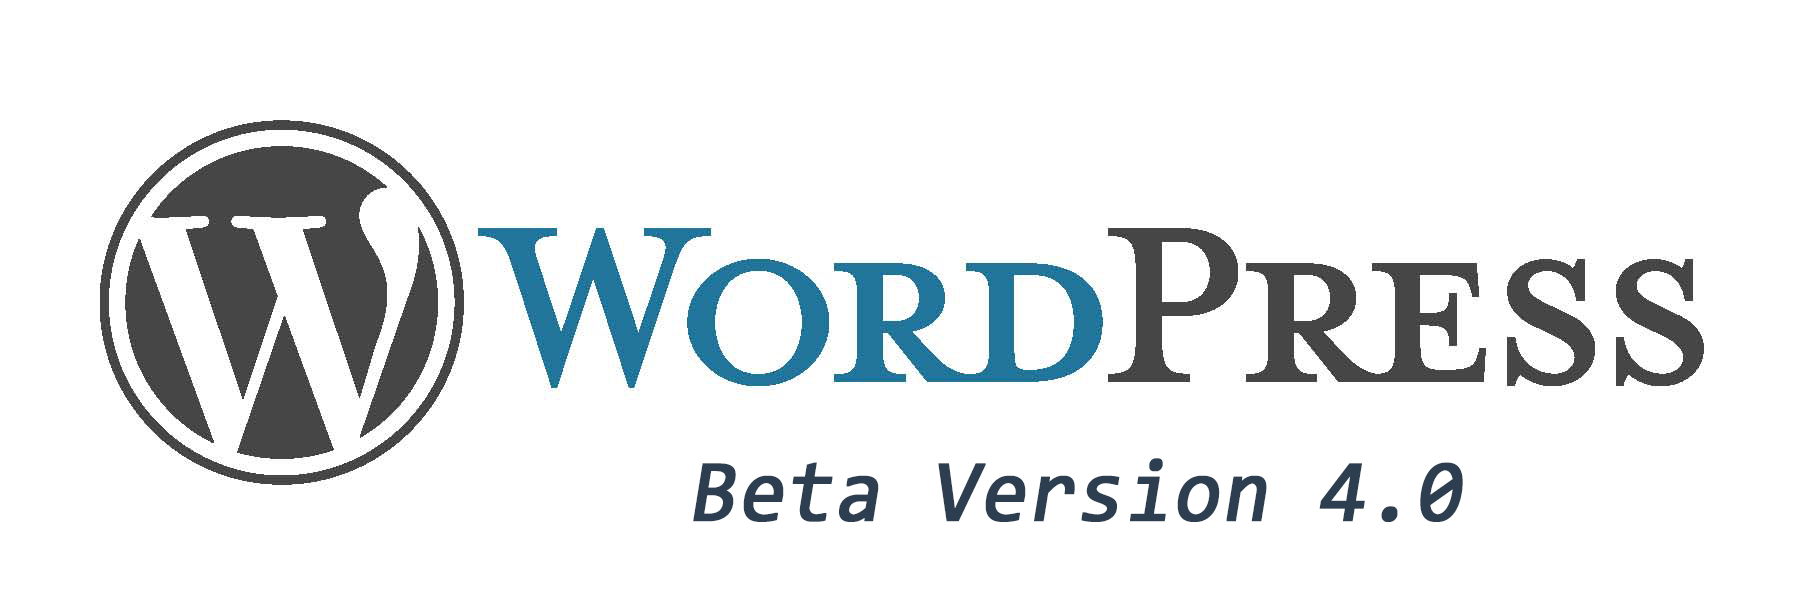 Wordpress beta 4